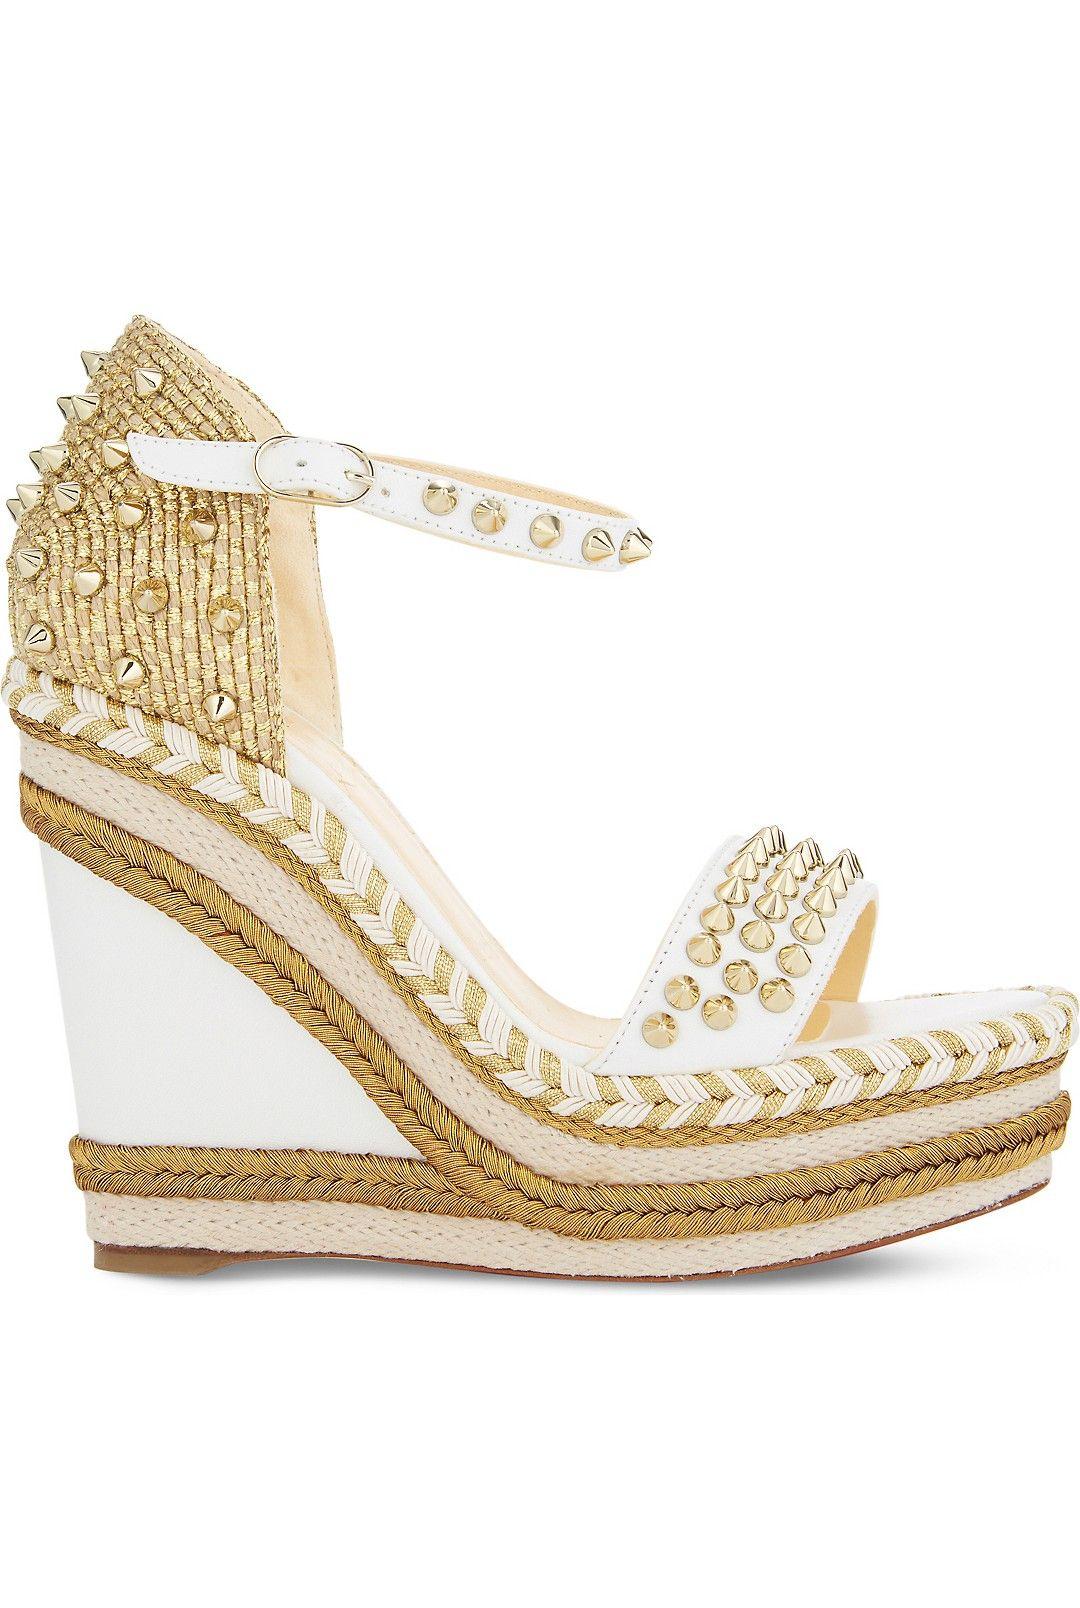 c29e09f3dc5 CHRISTIAN LOUBOUTIN Madmonica 120 nappa shiny | Louboutin | Shoes ...